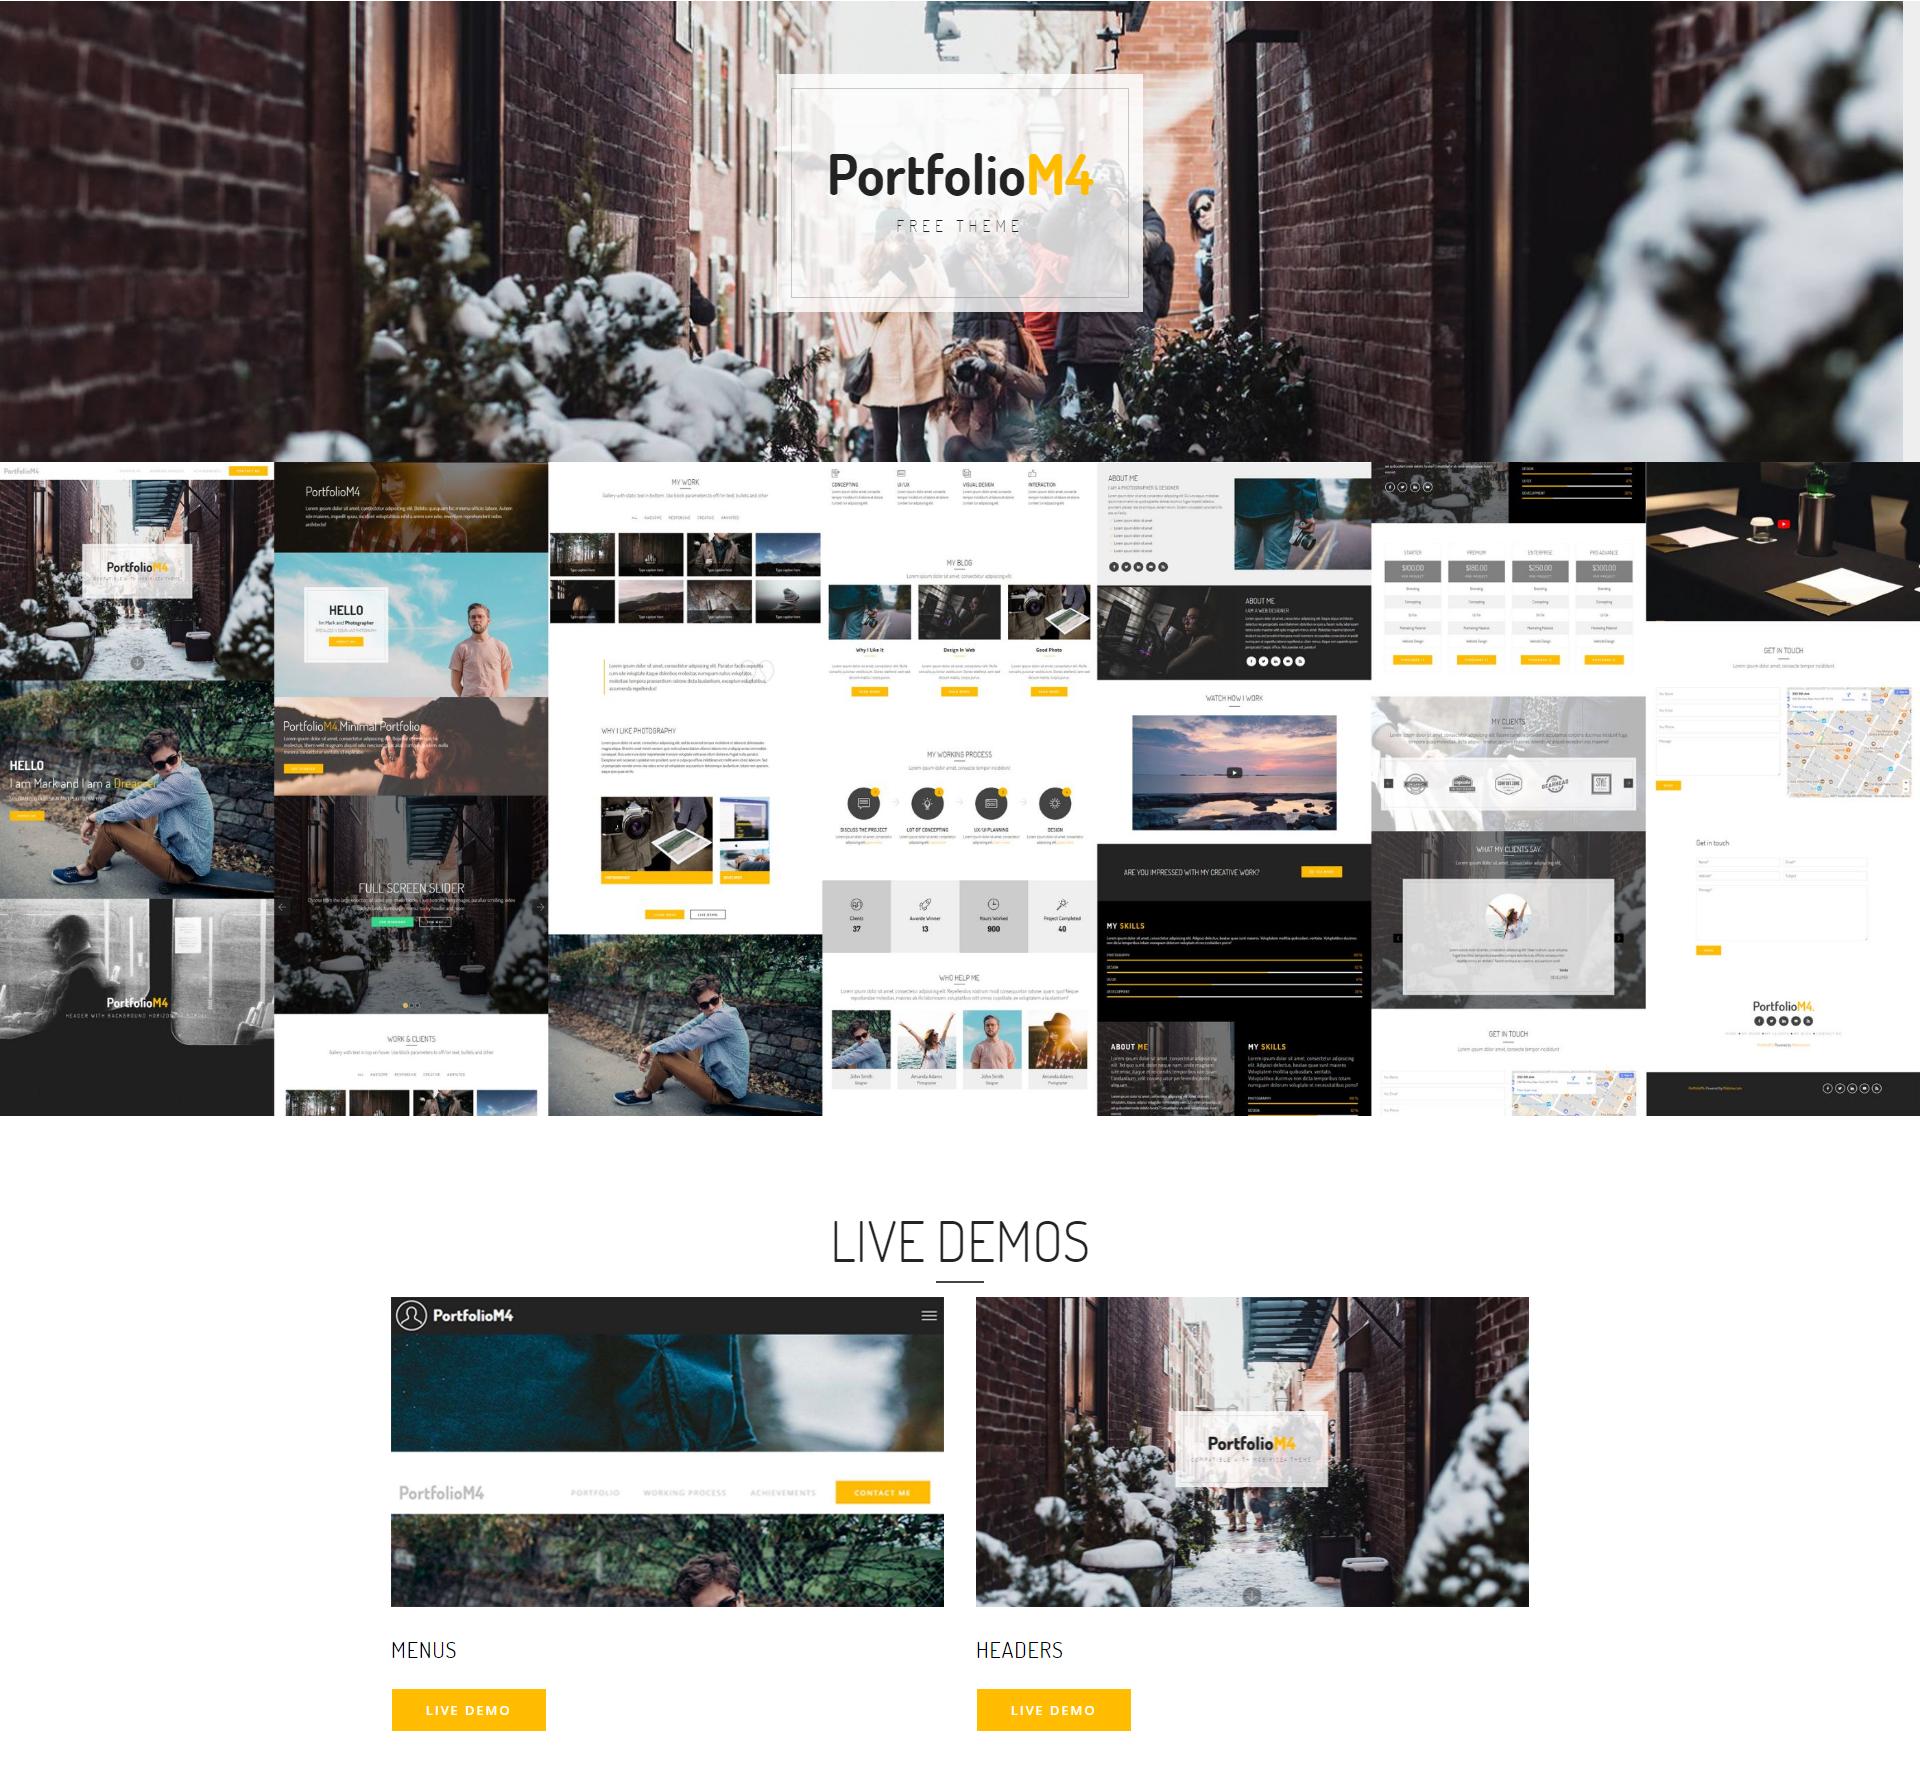 HTML Bootstrap PortfolioM4 Themes